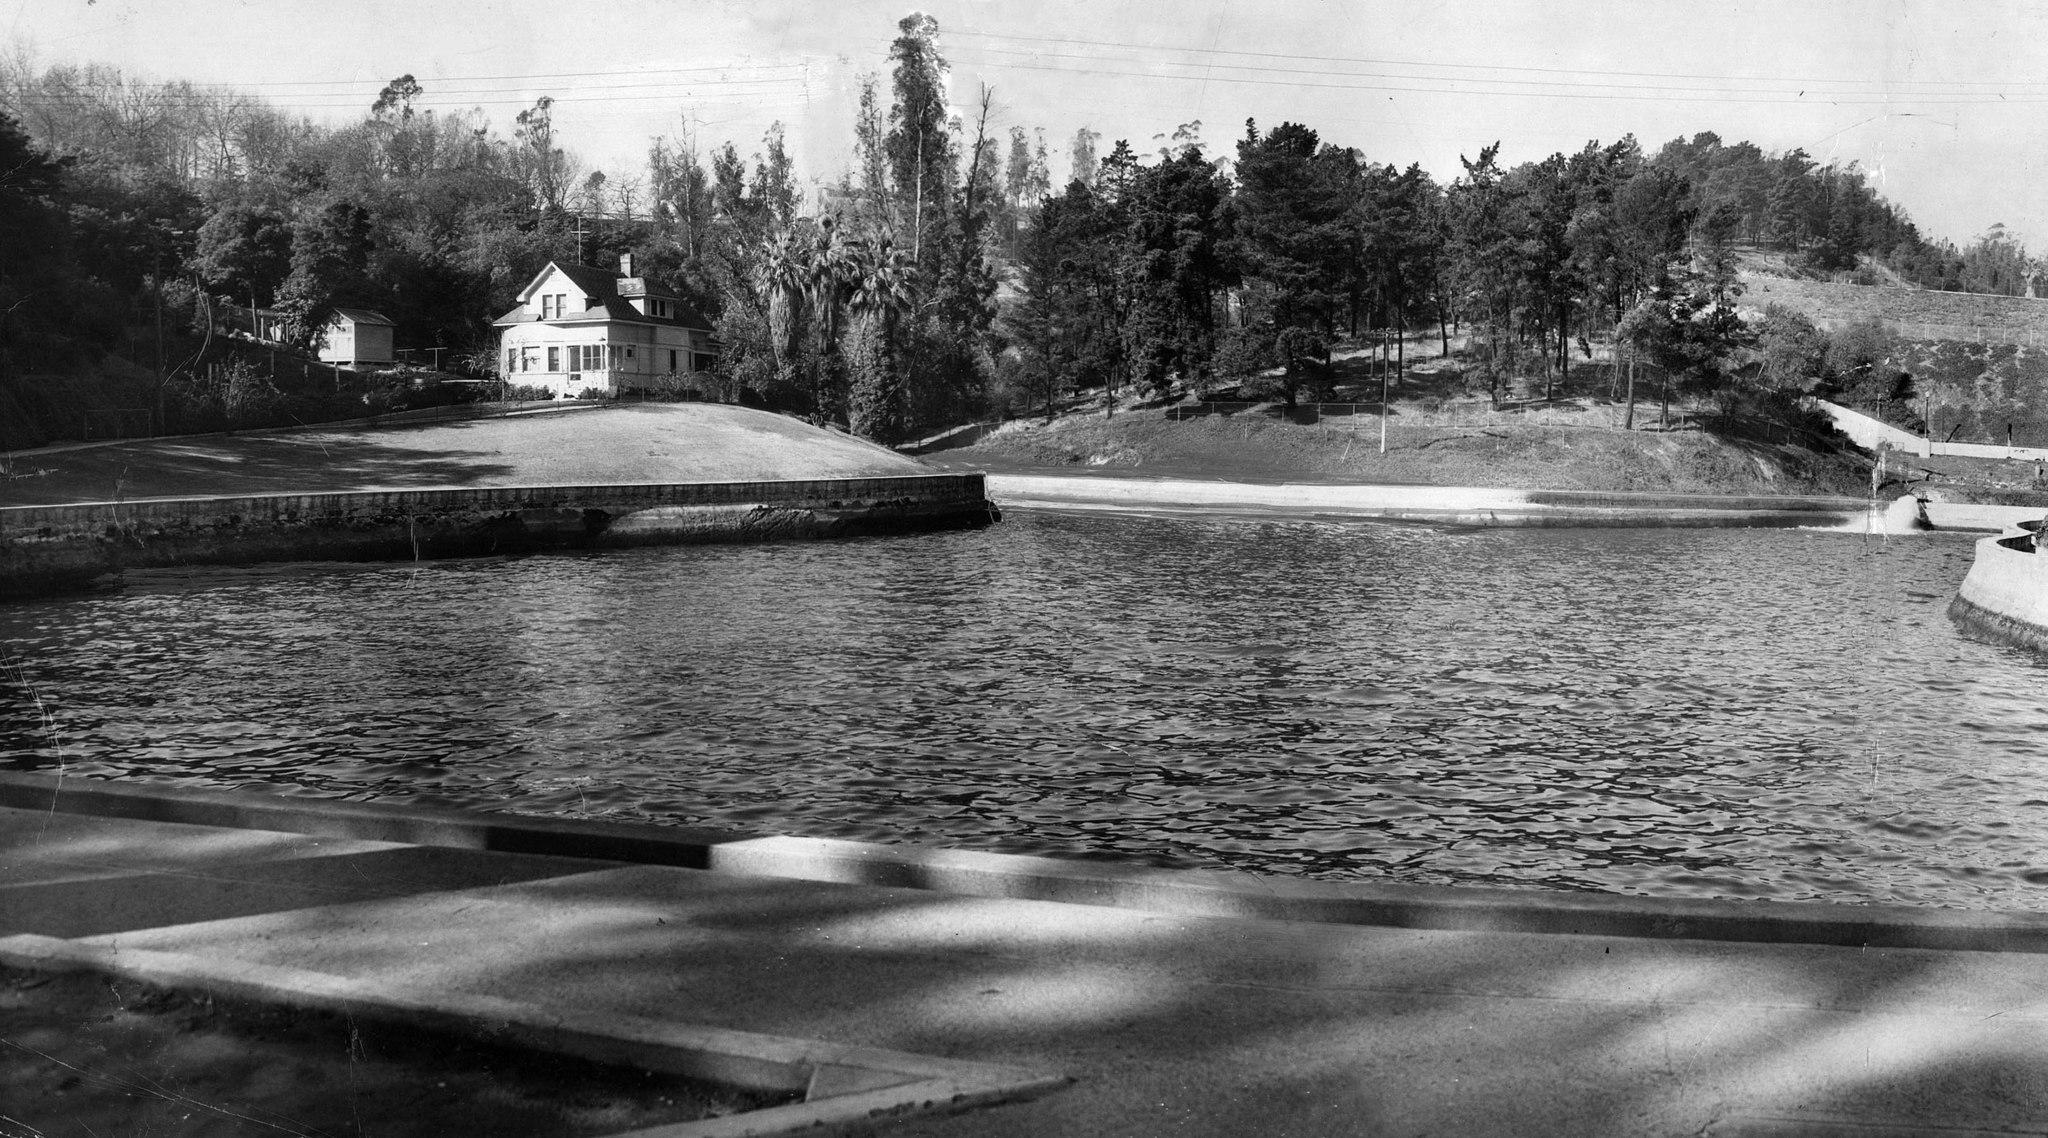 Dec. 22, 1949: View of caretaker's home at Buena Vista Reservoir in Elysian Park, alongside the Ar